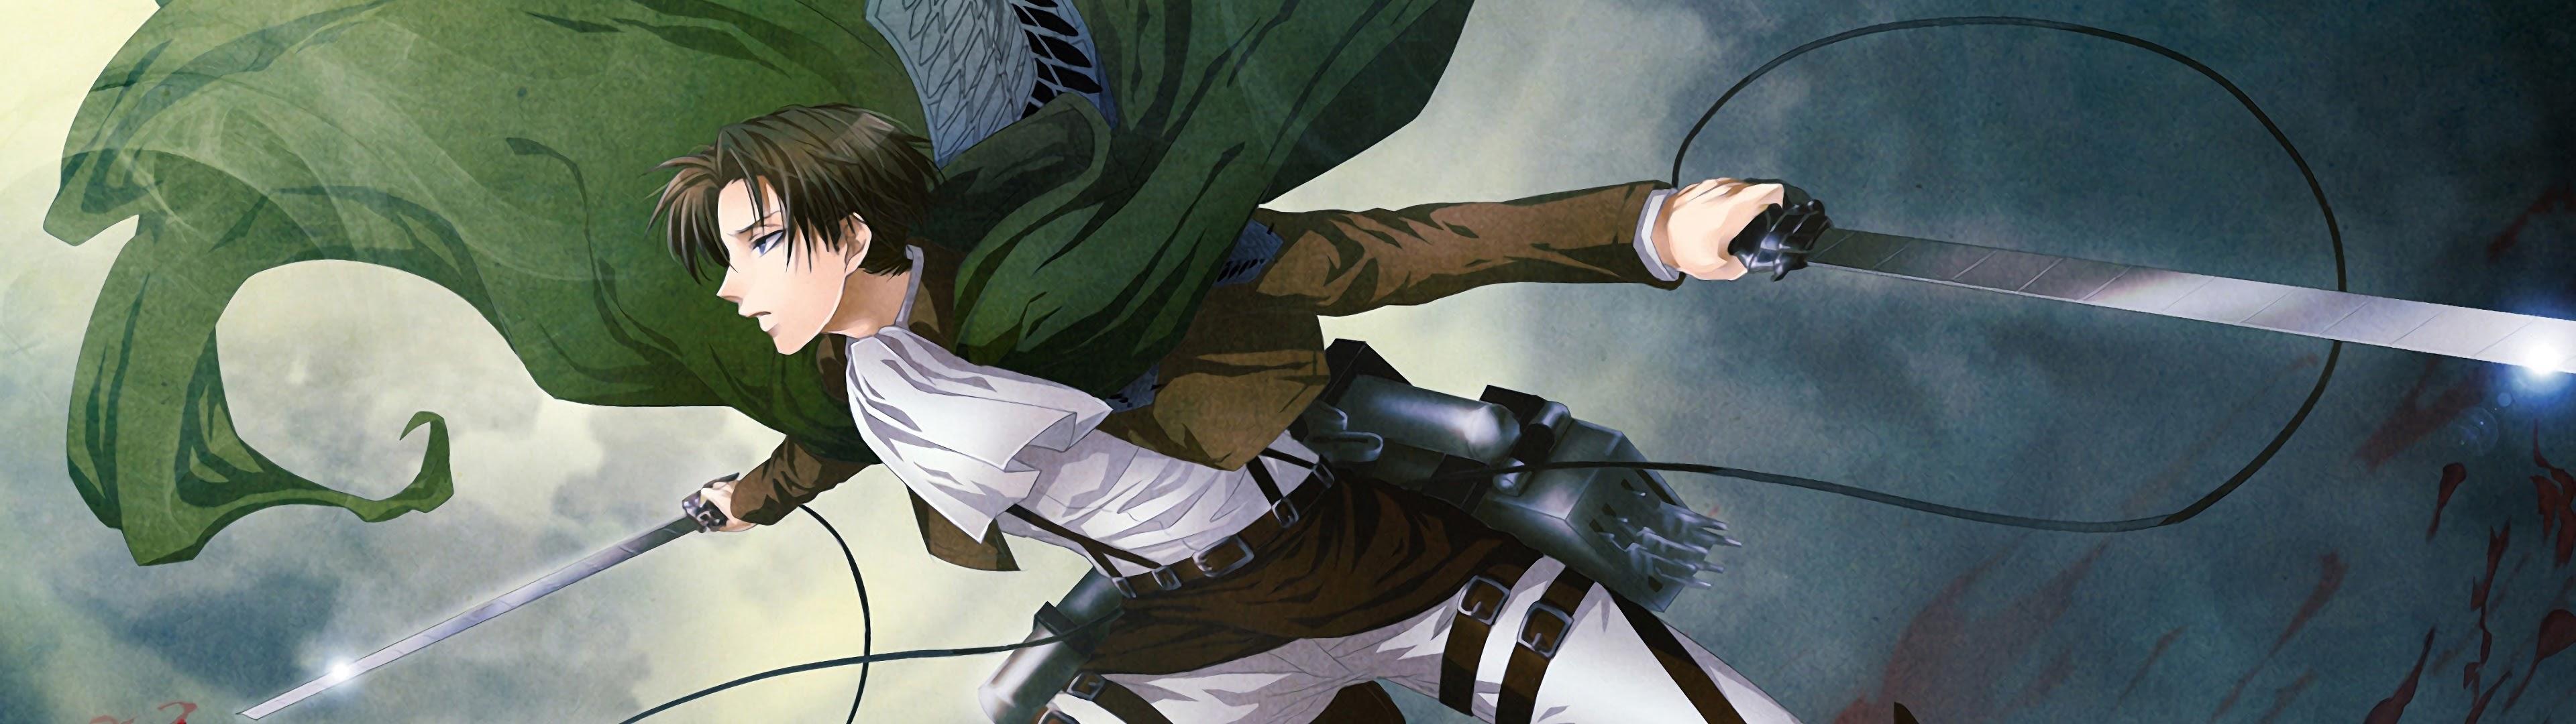 Levi Attack On Titan 4k Wallpaper 59